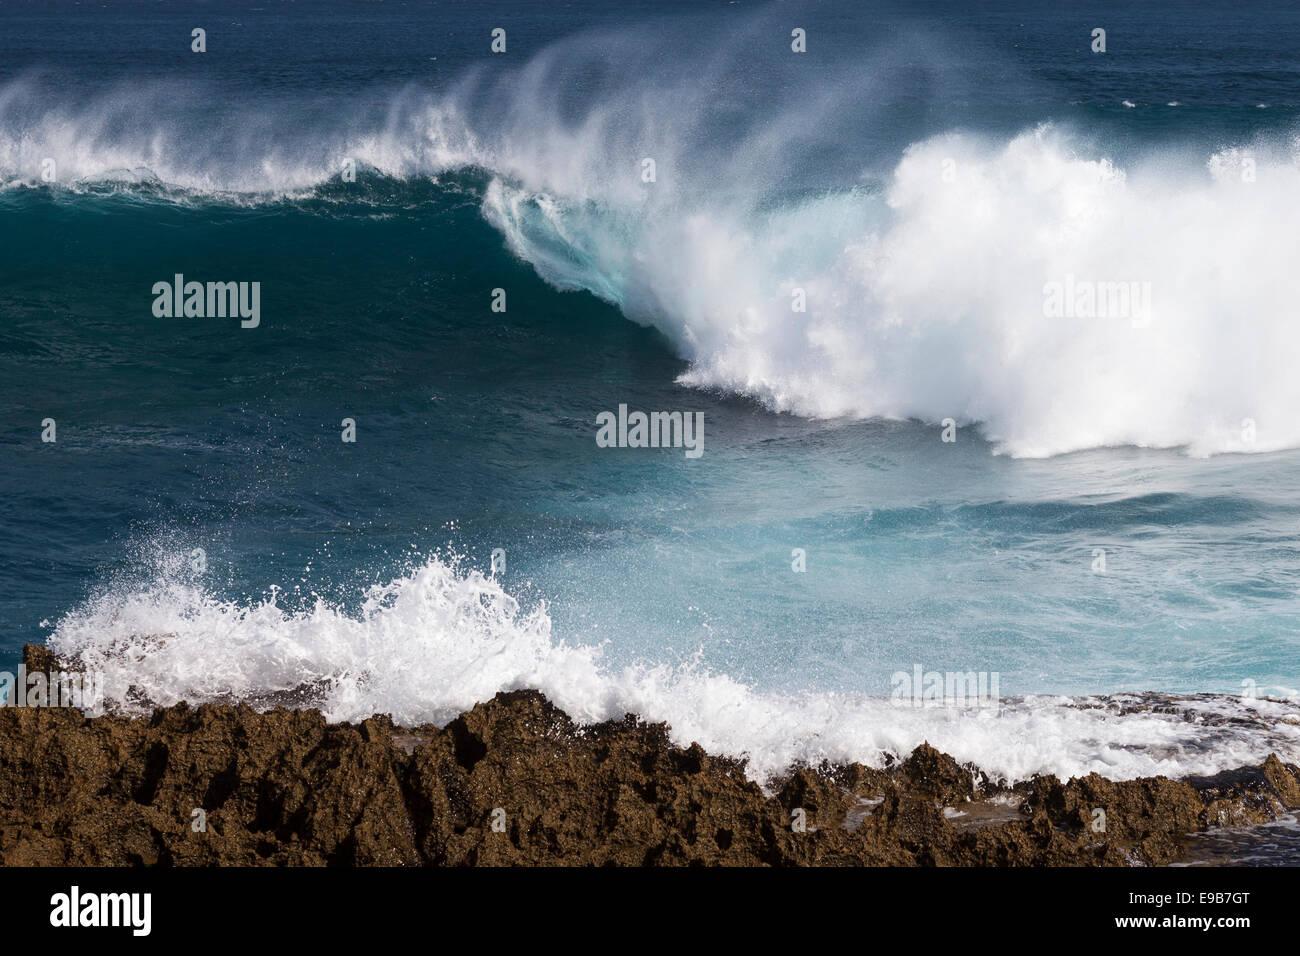 Breaking wave, [Nusa Lembongan], Bali, Indonesia - Stock Image